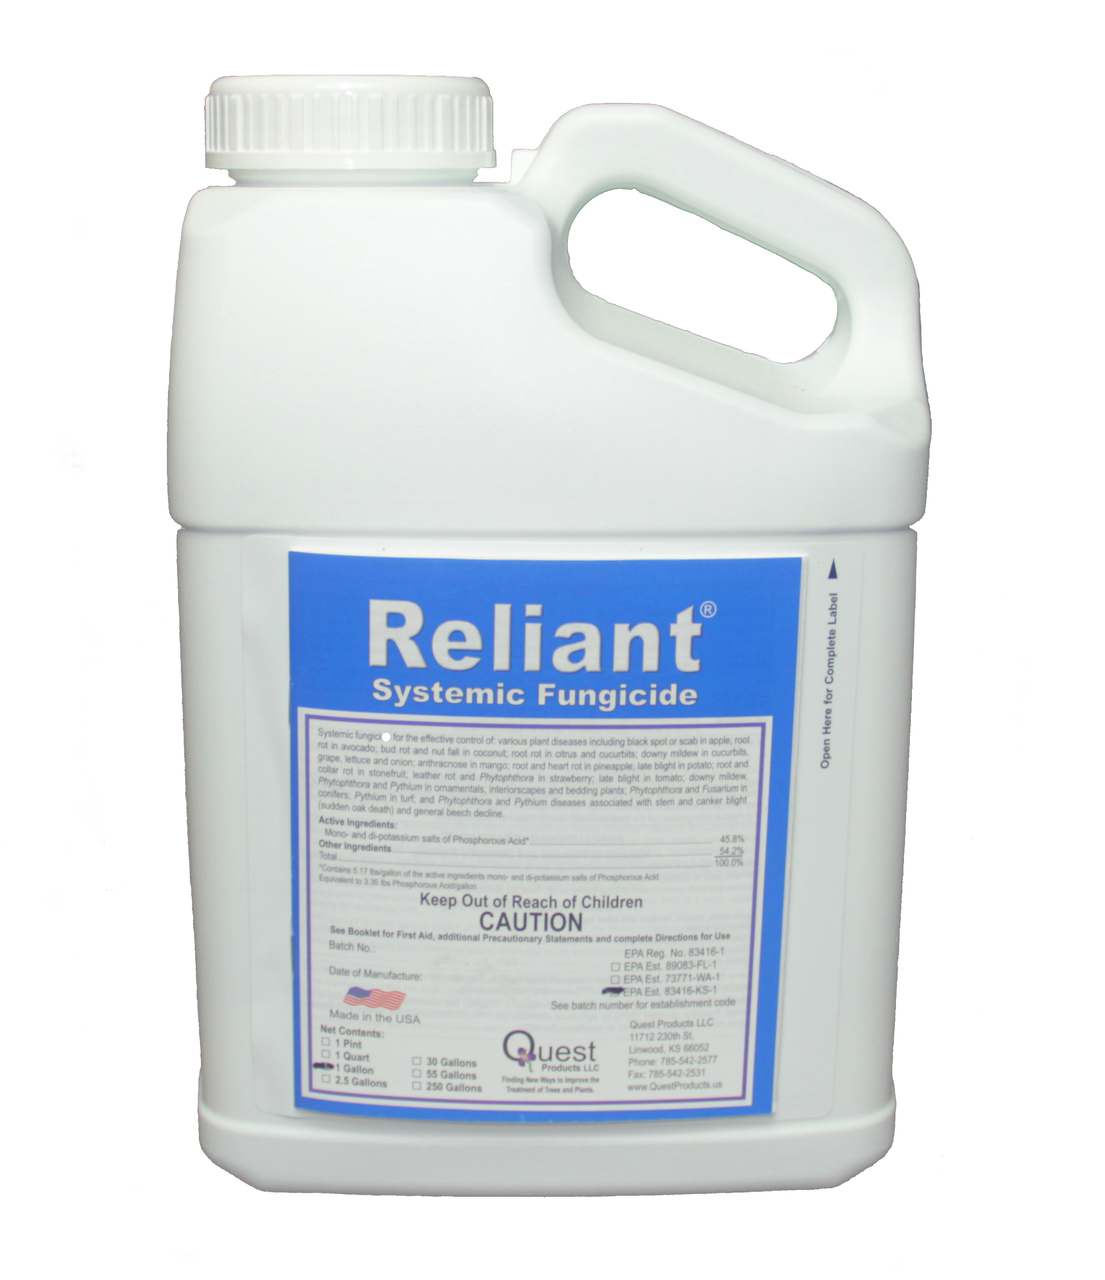 Reliant 1 Gallon 128oz Systemic Fungicide at VivaGrow.com